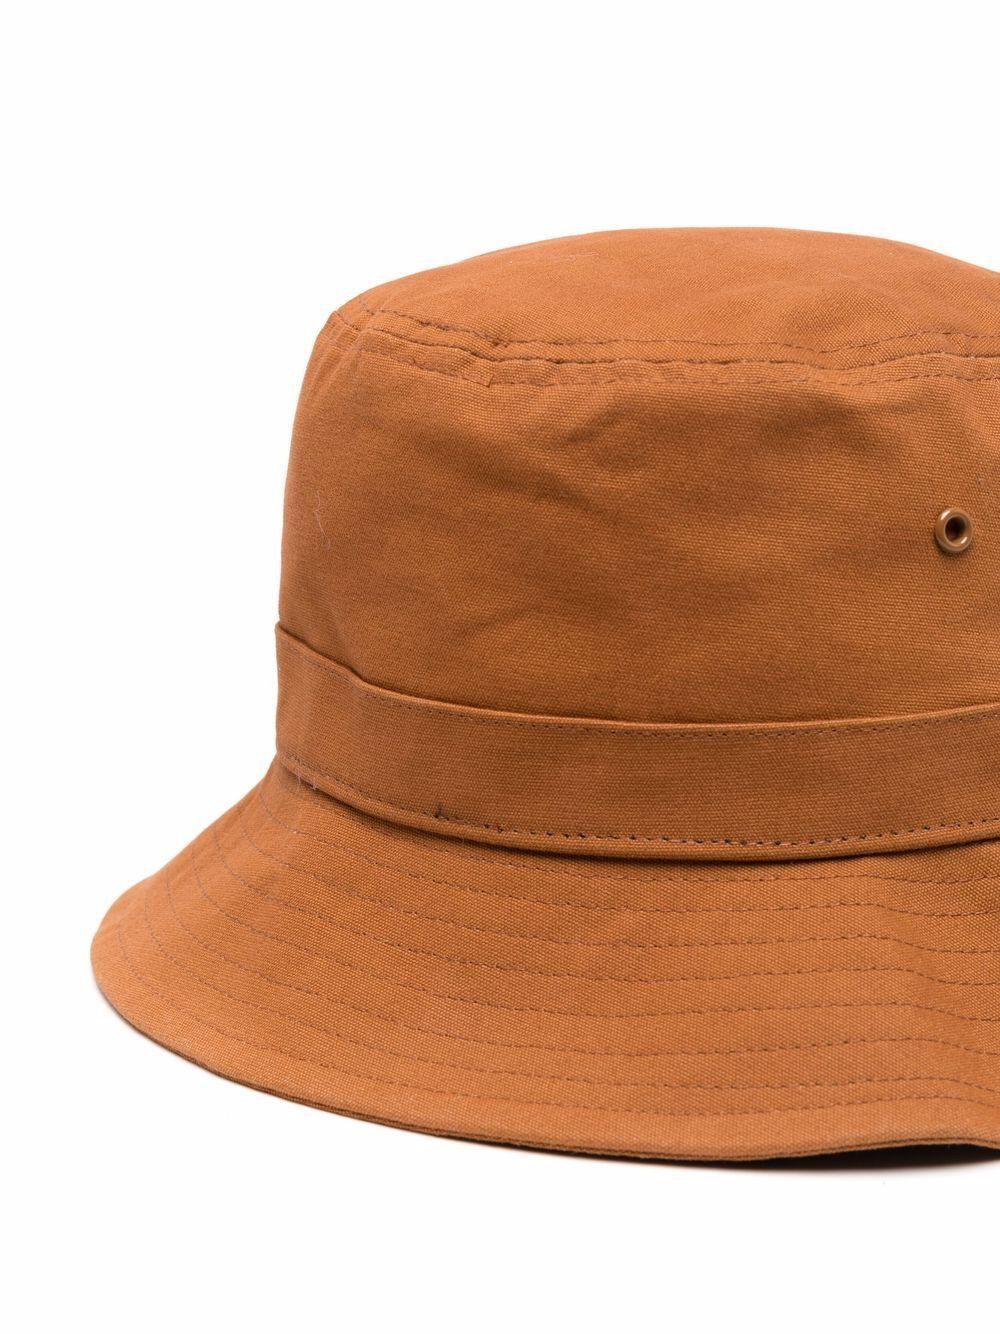 cappello bucket unisex marrone in cotone CARHARTT WIP | Cappelli | I0262170AB.90